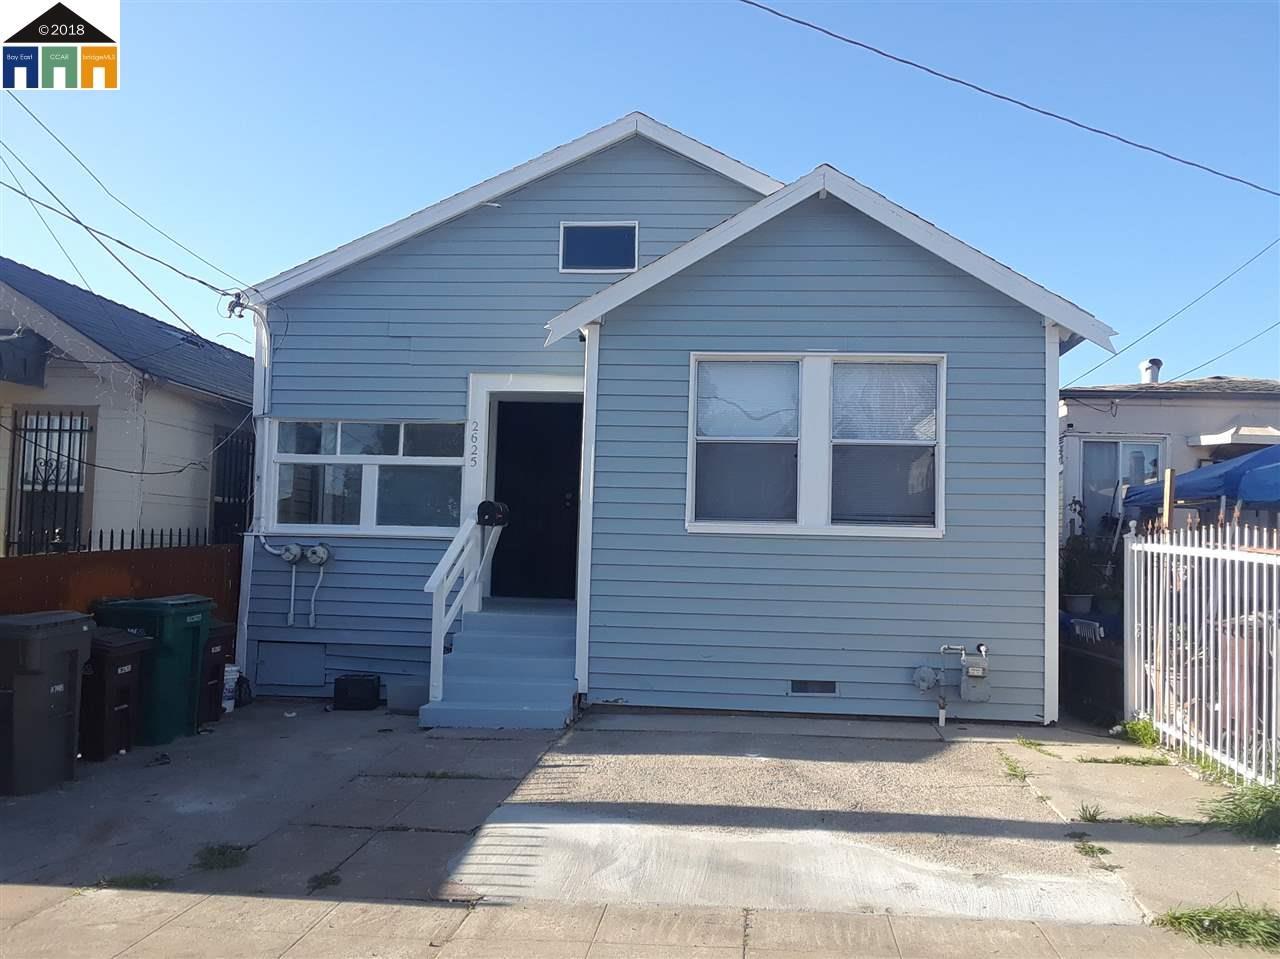 واحد منزل الأسرة للـ Sale في 2625 75th Avenue 2625 75th Avenue Oakland, California 94605 United States